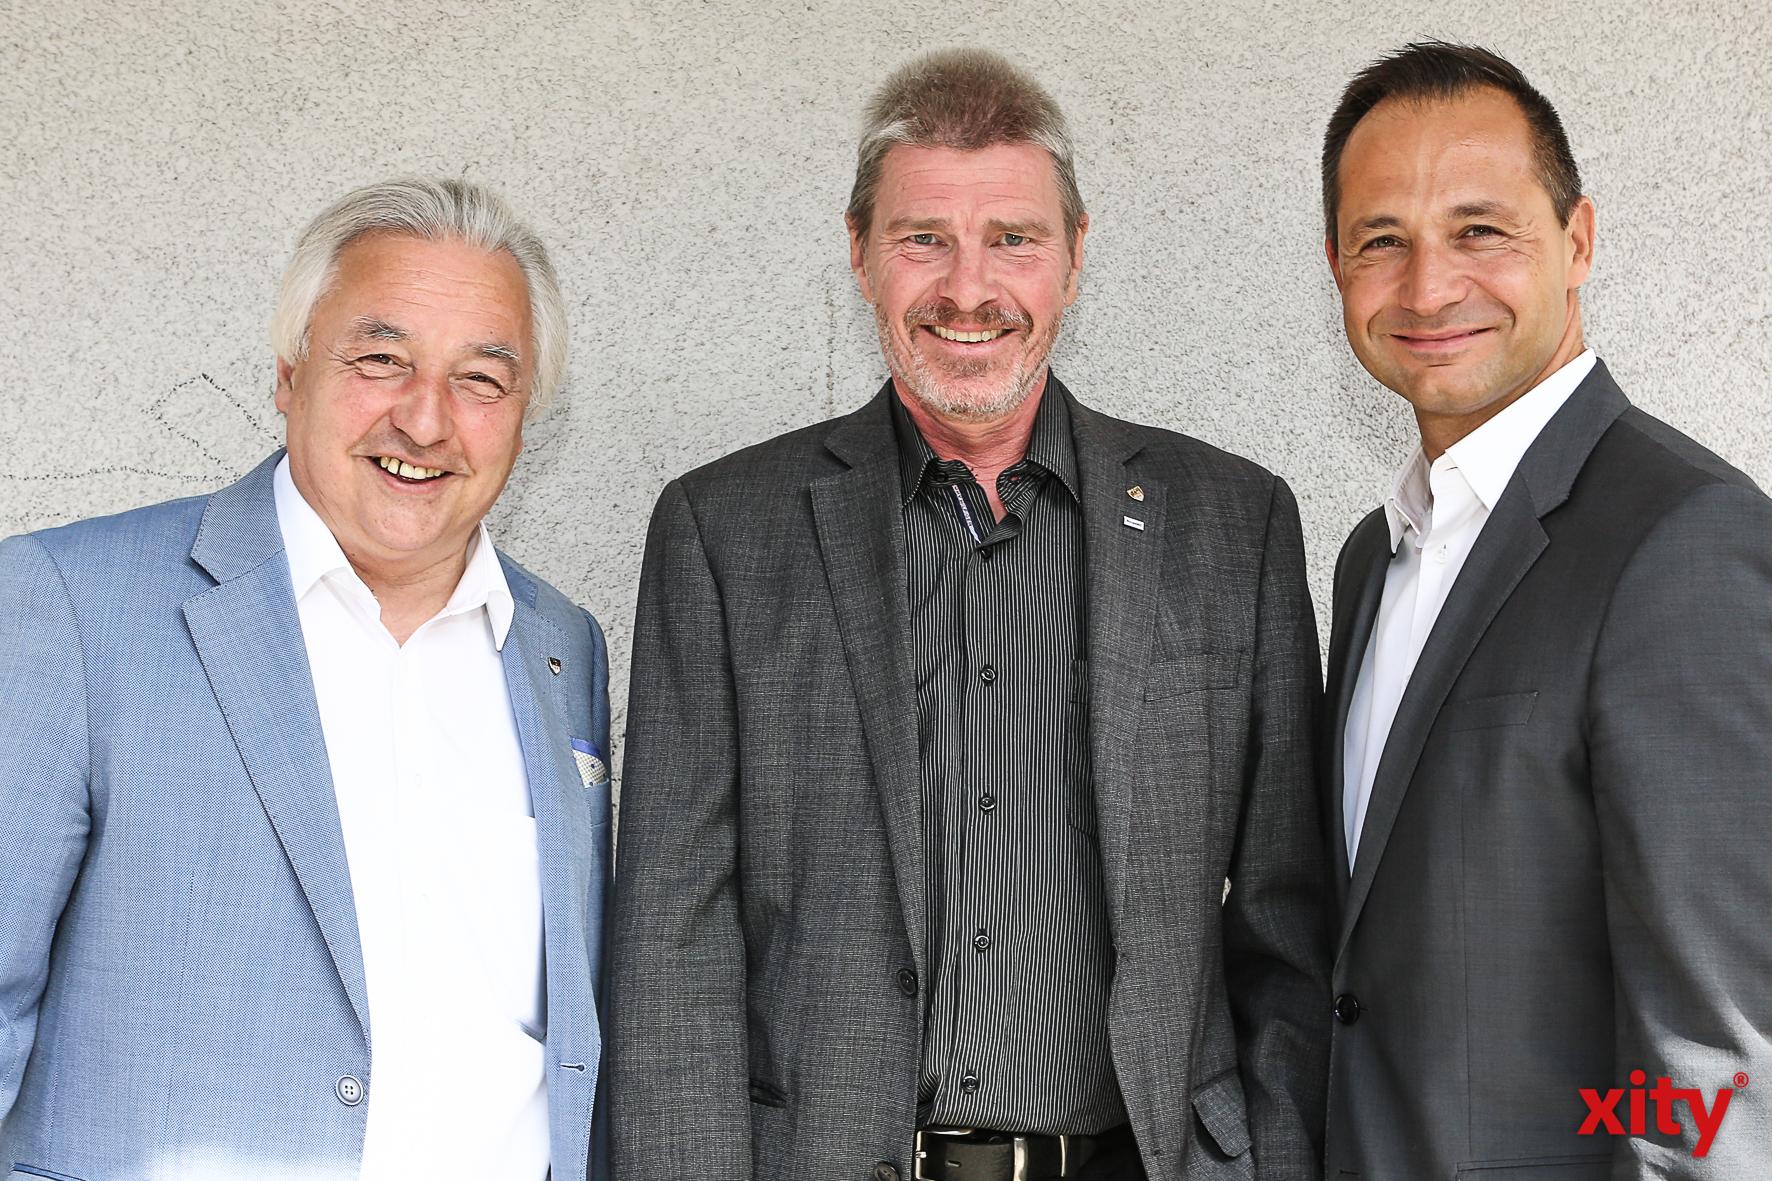 Bürgermeister Volker Mosblech, Schuldezernent Thomas Krützberg, Schulleiter Pavle Madzirov (Foto: xity)